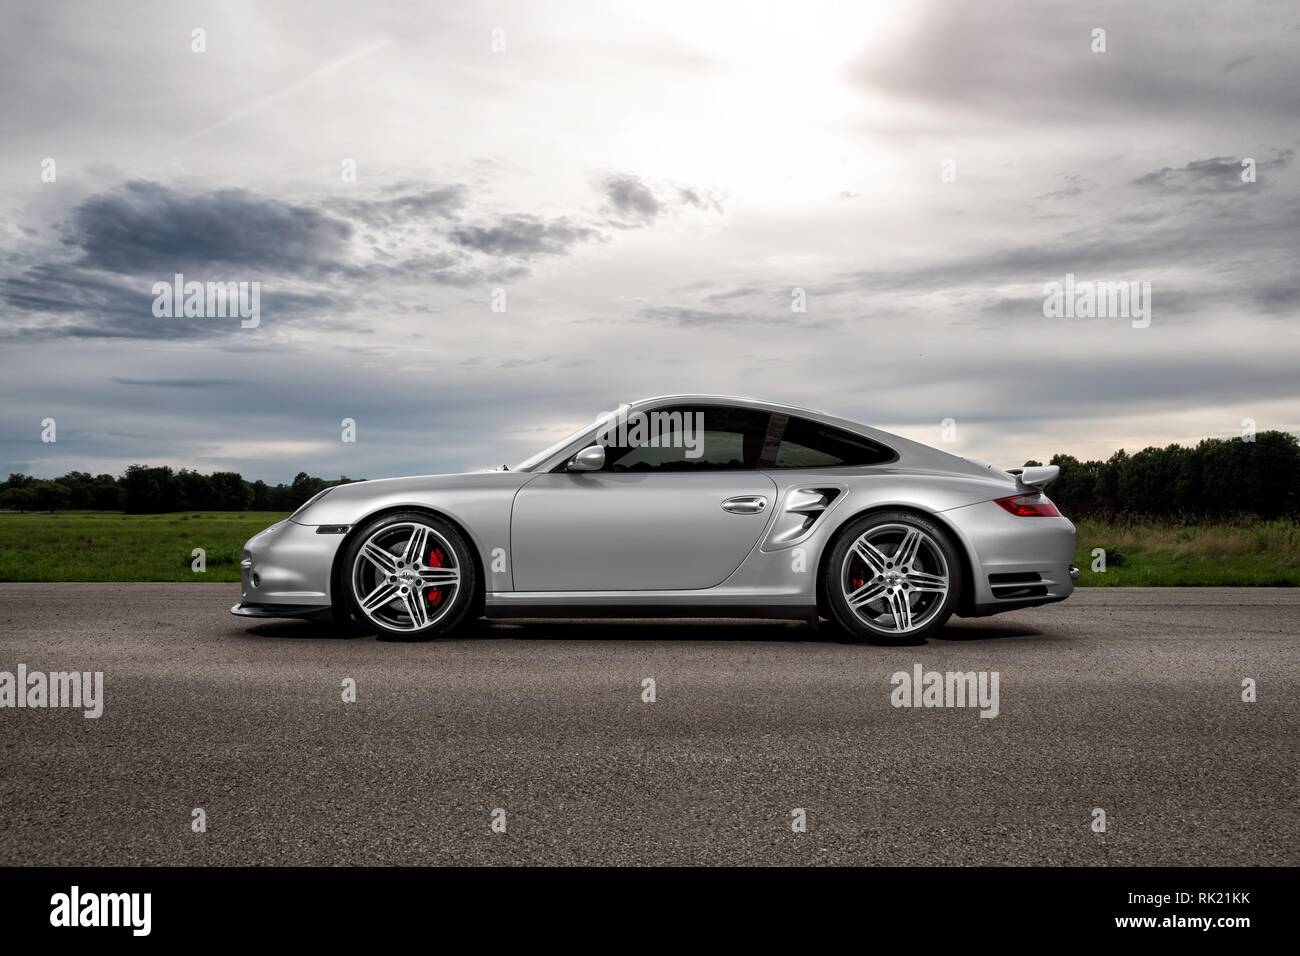 Porsche 997 Turbo Stock Photo Alamy